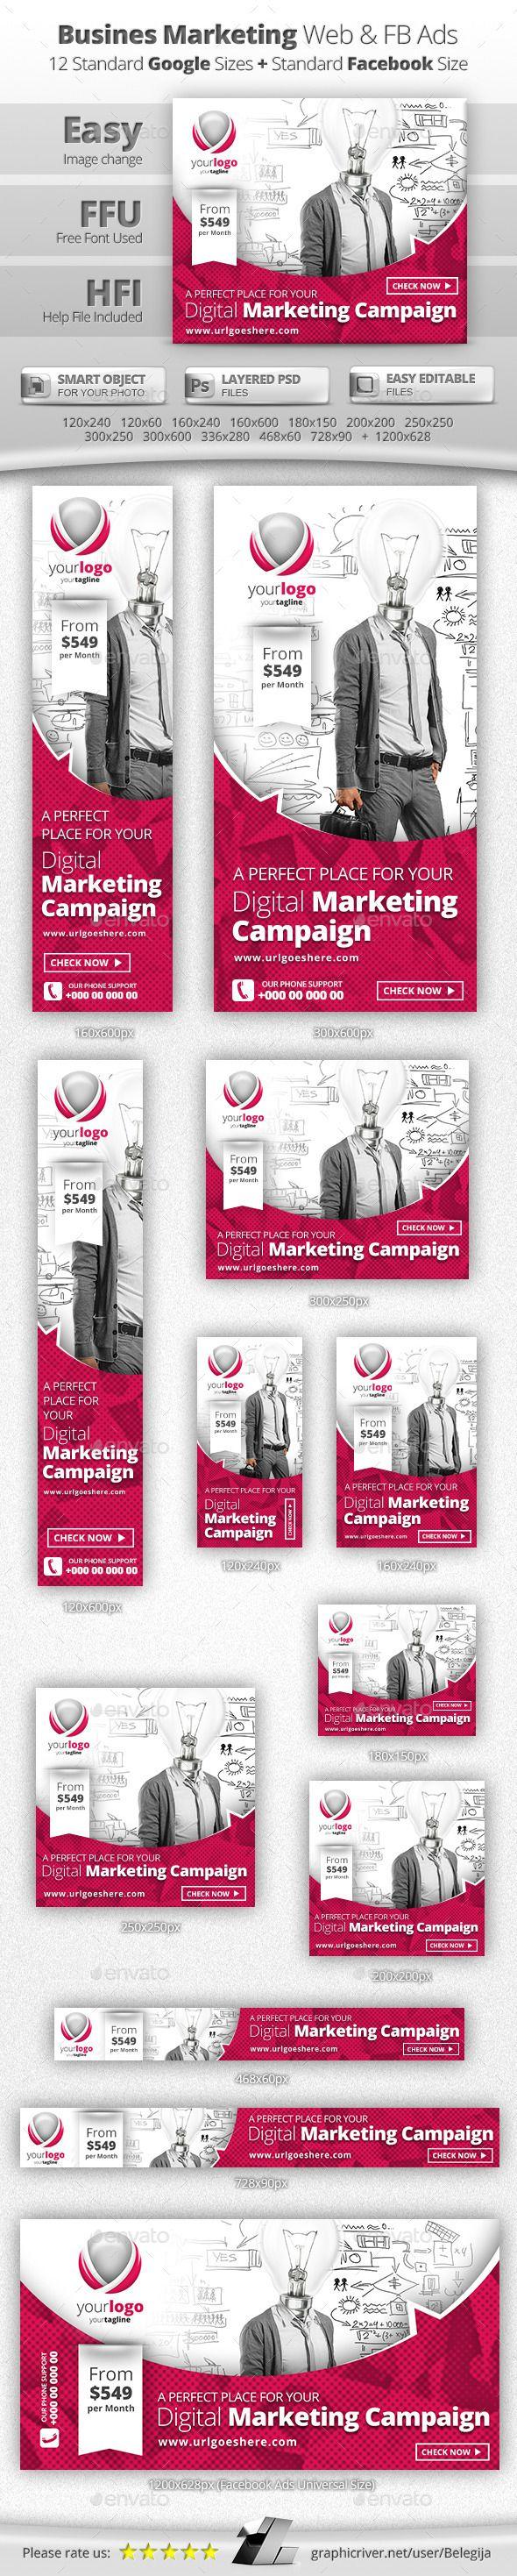 Business Marketing Campaign Web & Facebook Banners Tempalte #design Download: http://graphicriver.net/item/business-marketing-campaign-web-facebook-banners/11453765?ref=ksioks